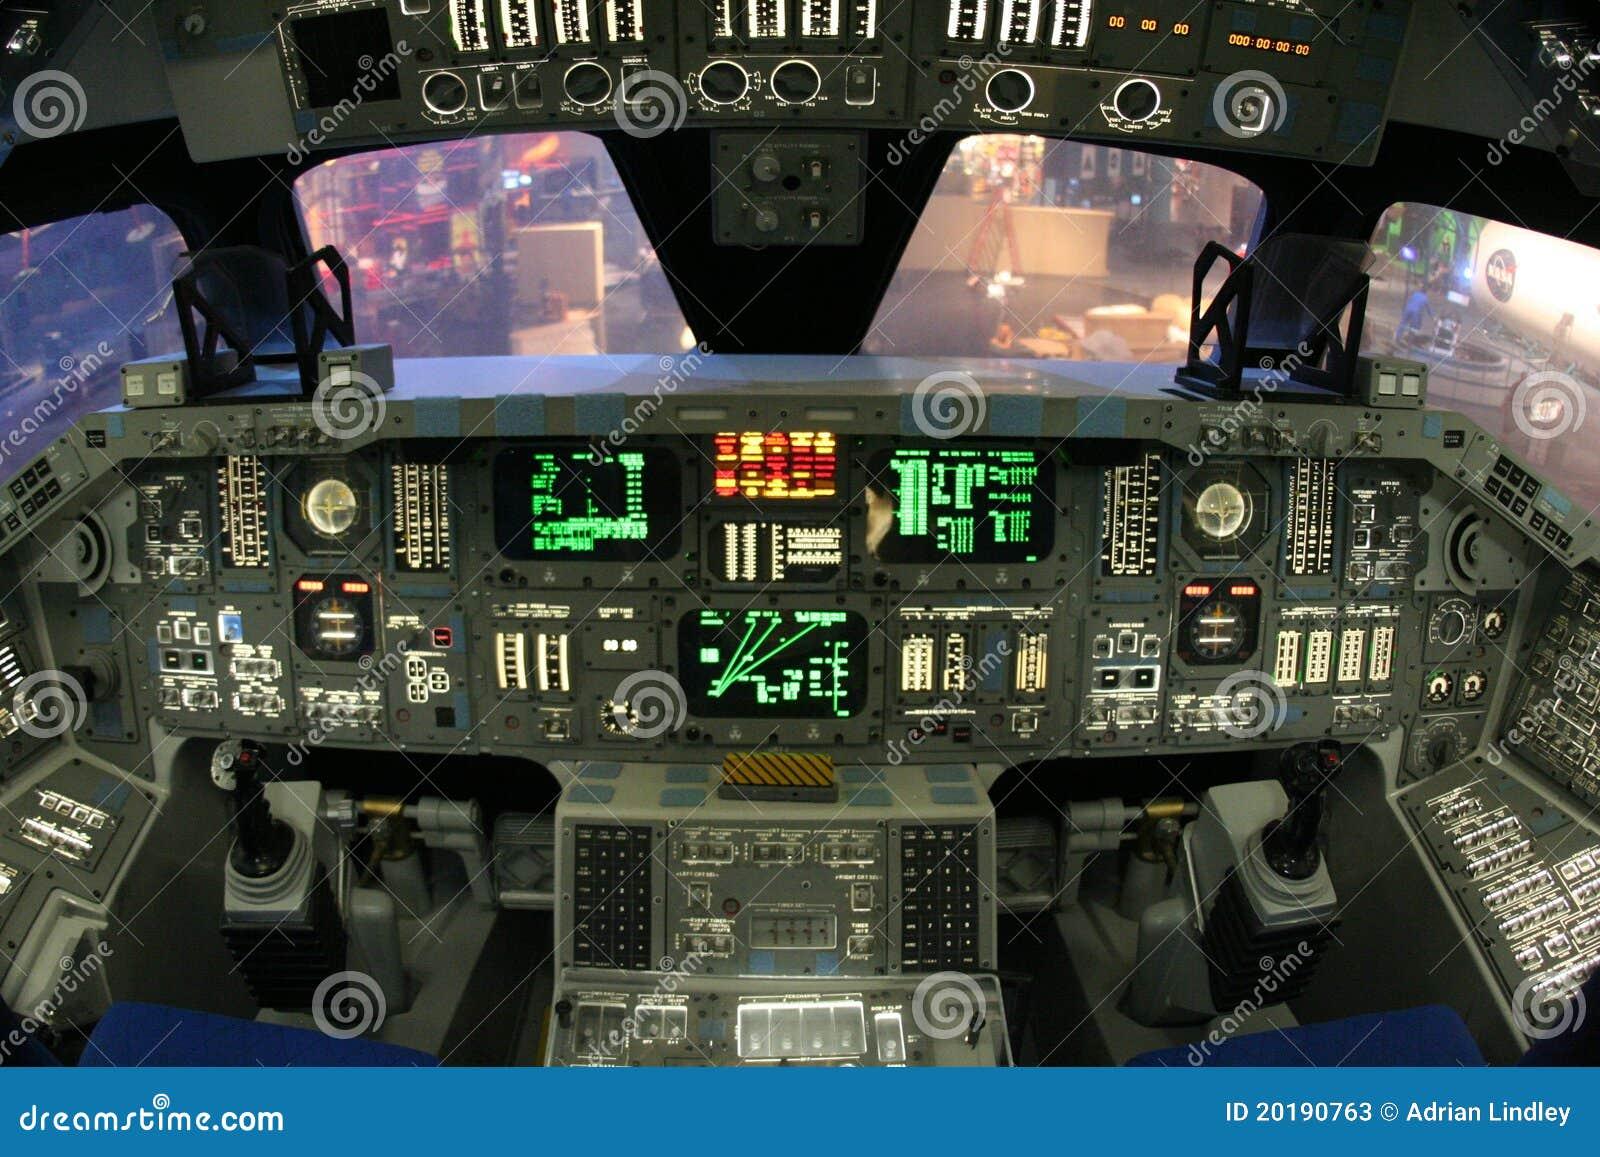 cockpit nasa saucer - photo #41